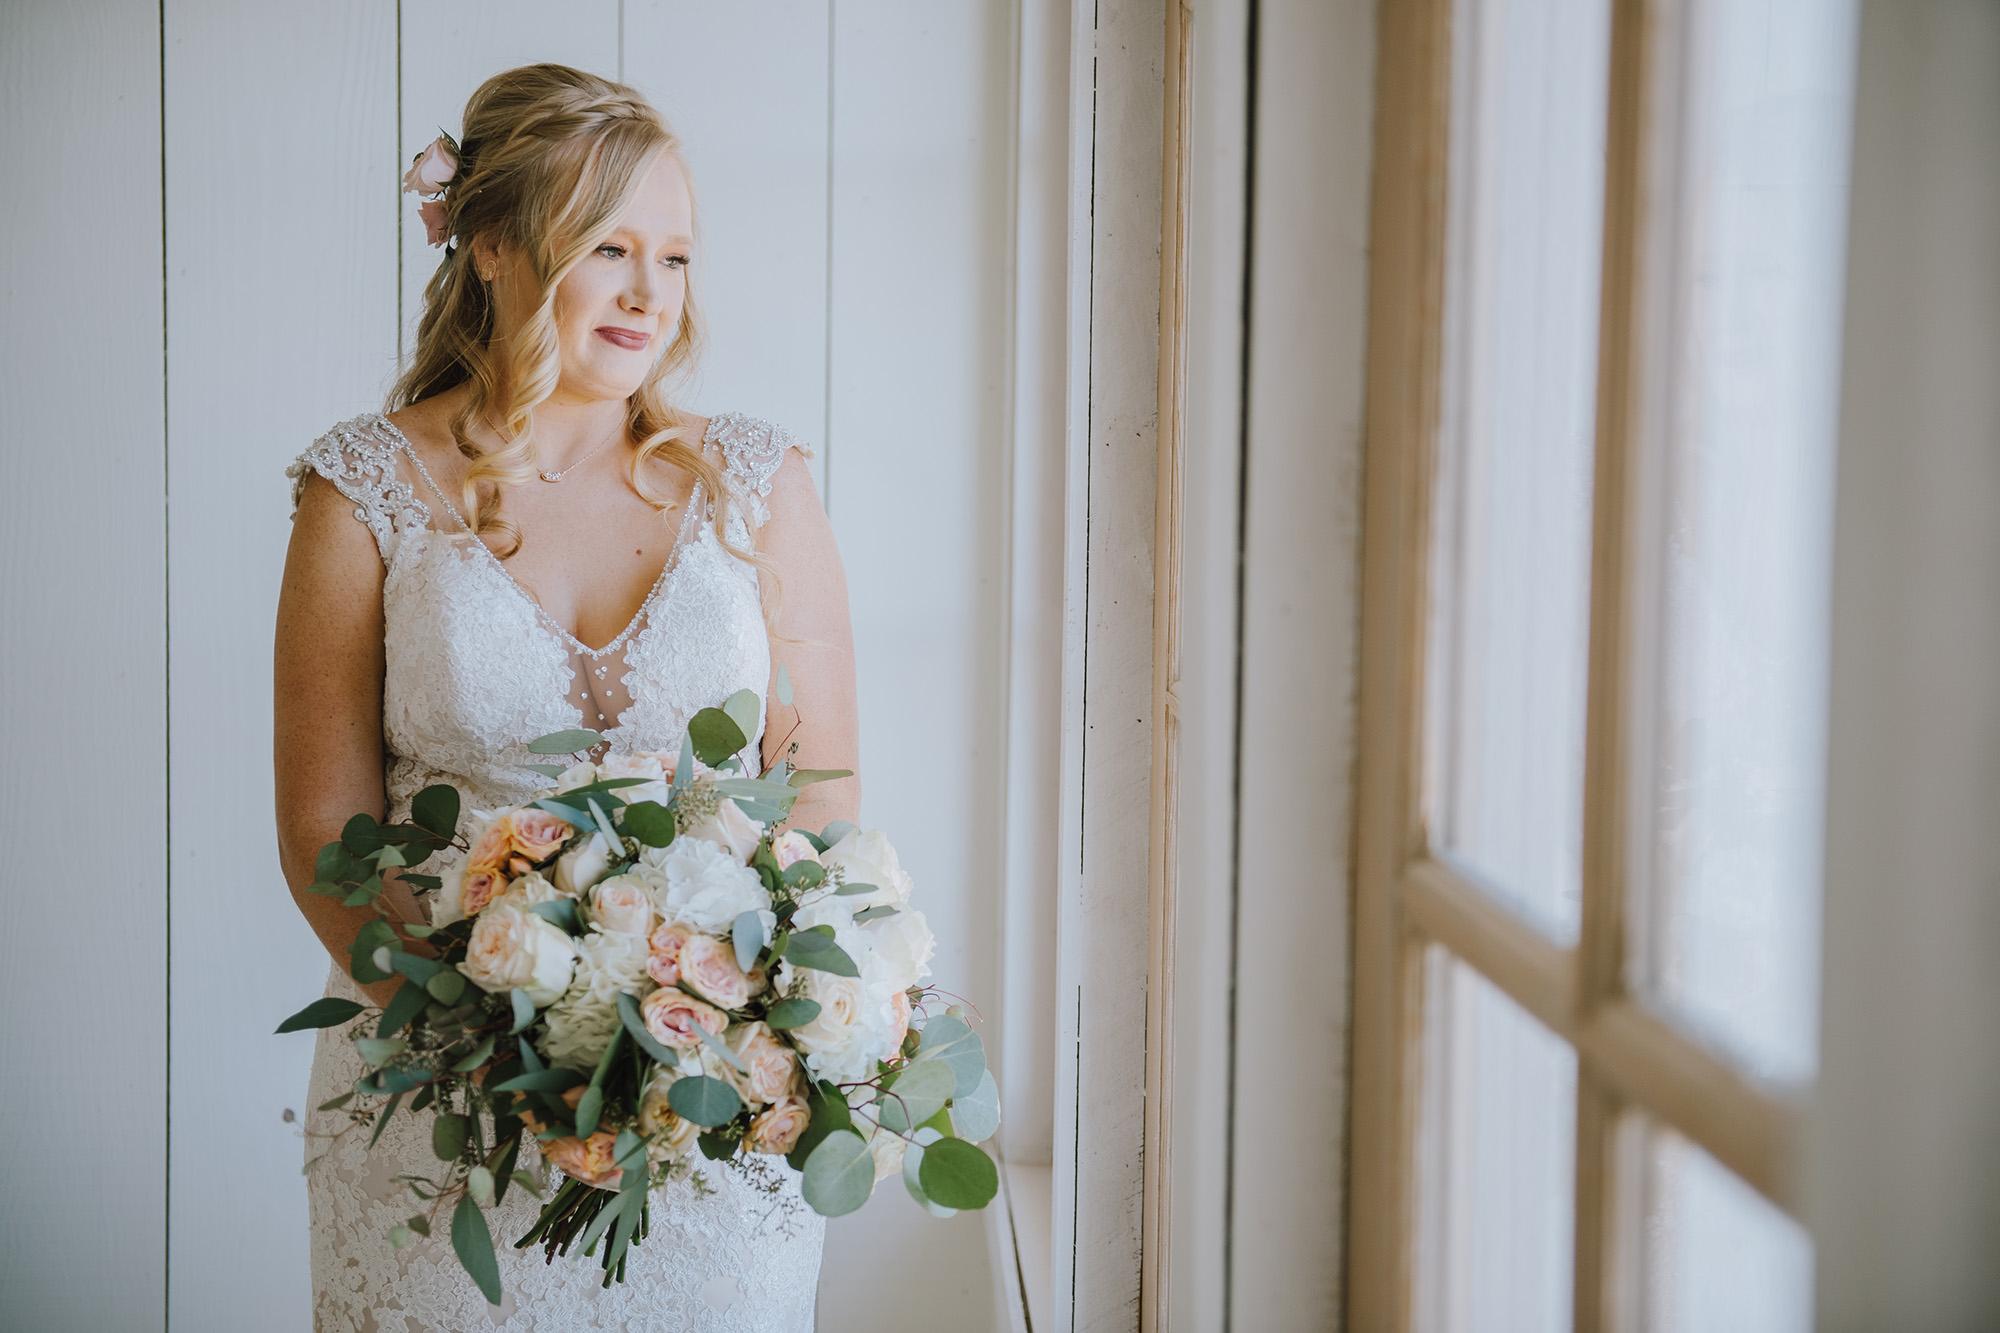 Gorgeous Wedding Bouquets - The Grand Ivory Wedding - Leonard, Texas Wedding Venue